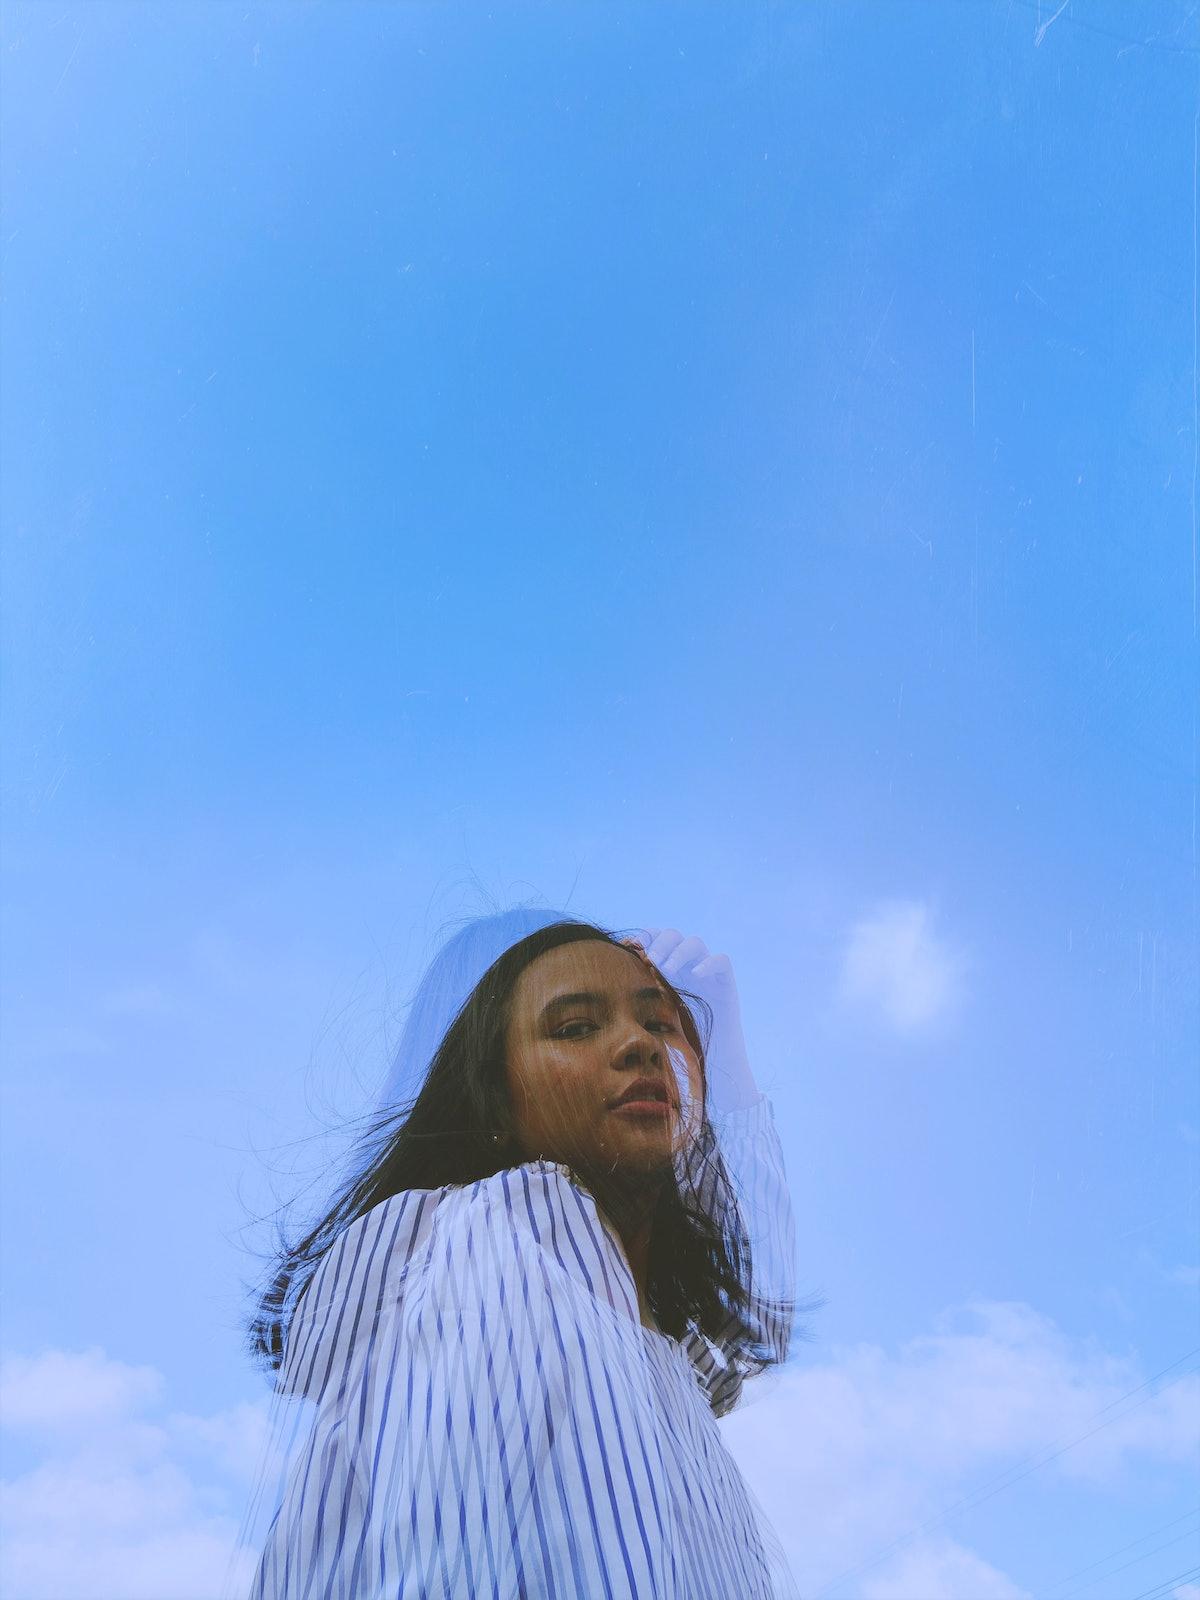 Young misunderstood Aquarius woman against a blue sky.